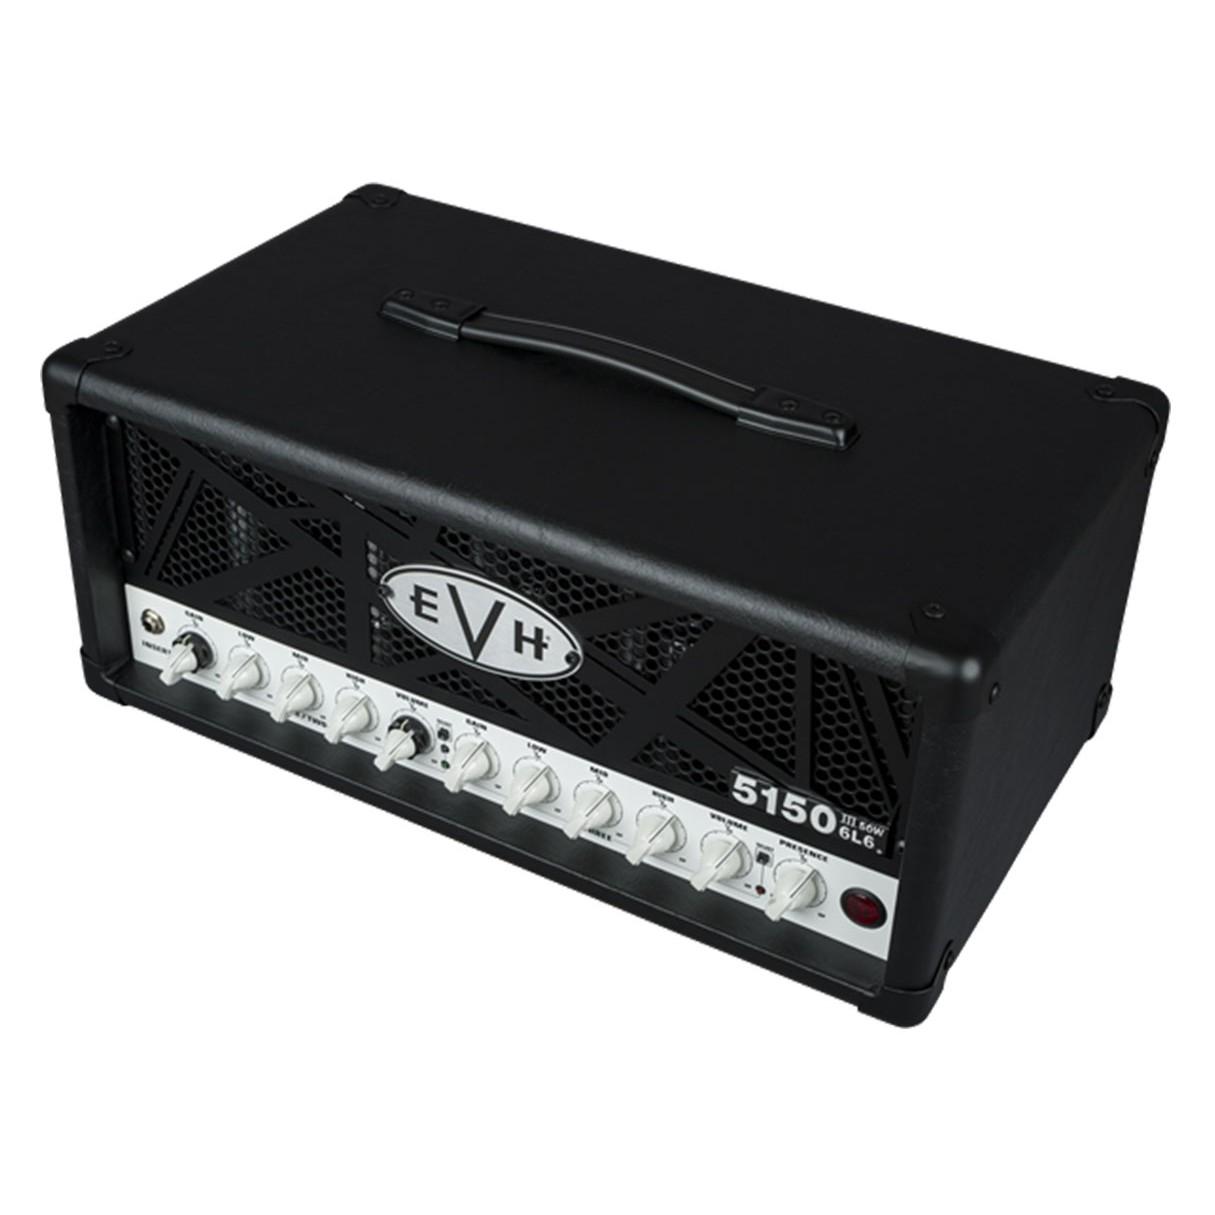 evh 5150iii 50 watt 6l6 guitar head black. Black Bedroom Furniture Sets. Home Design Ideas